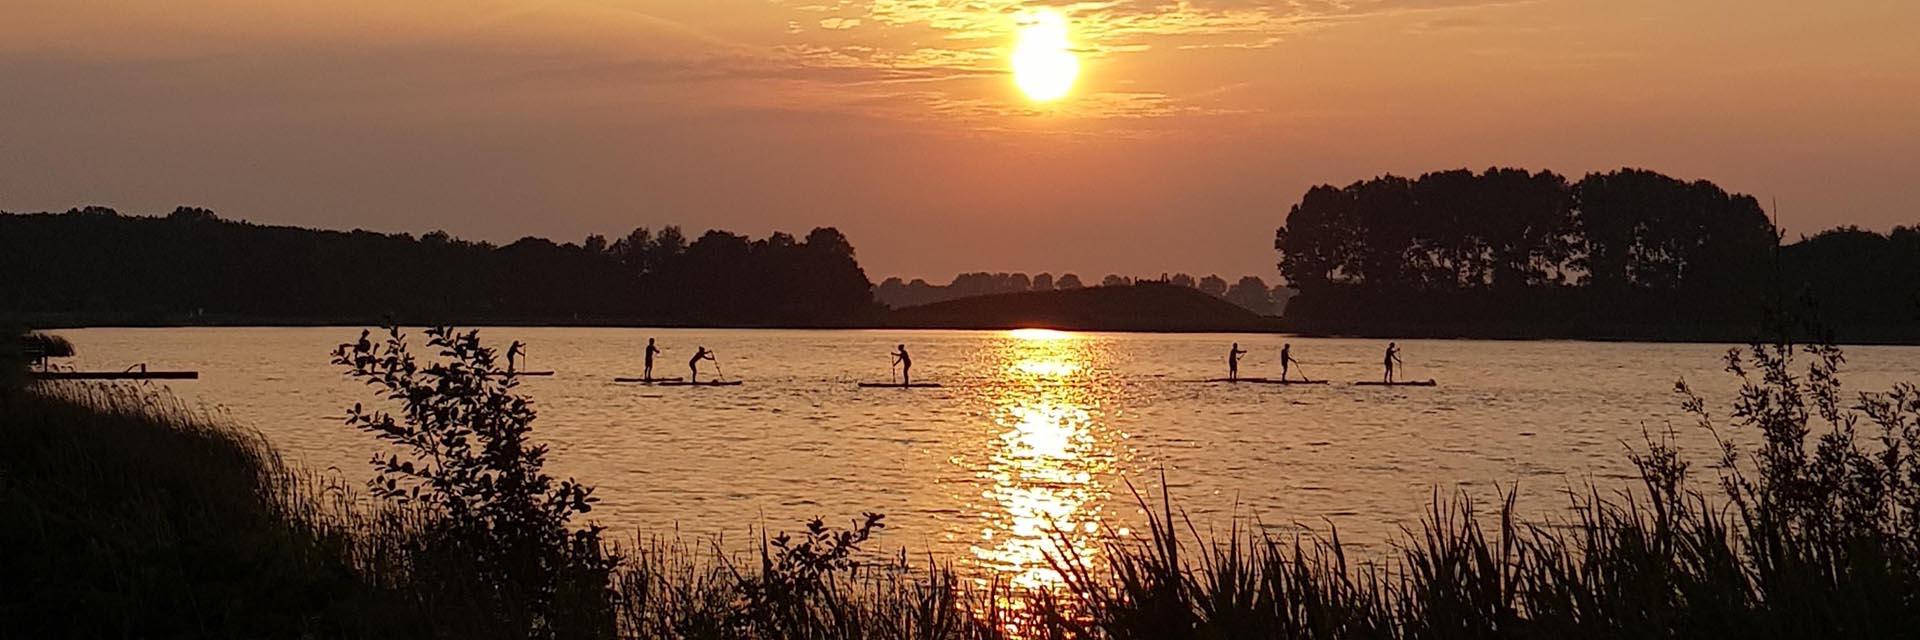 SUP-les-Alkmaar-Geestmerambacht-sunset